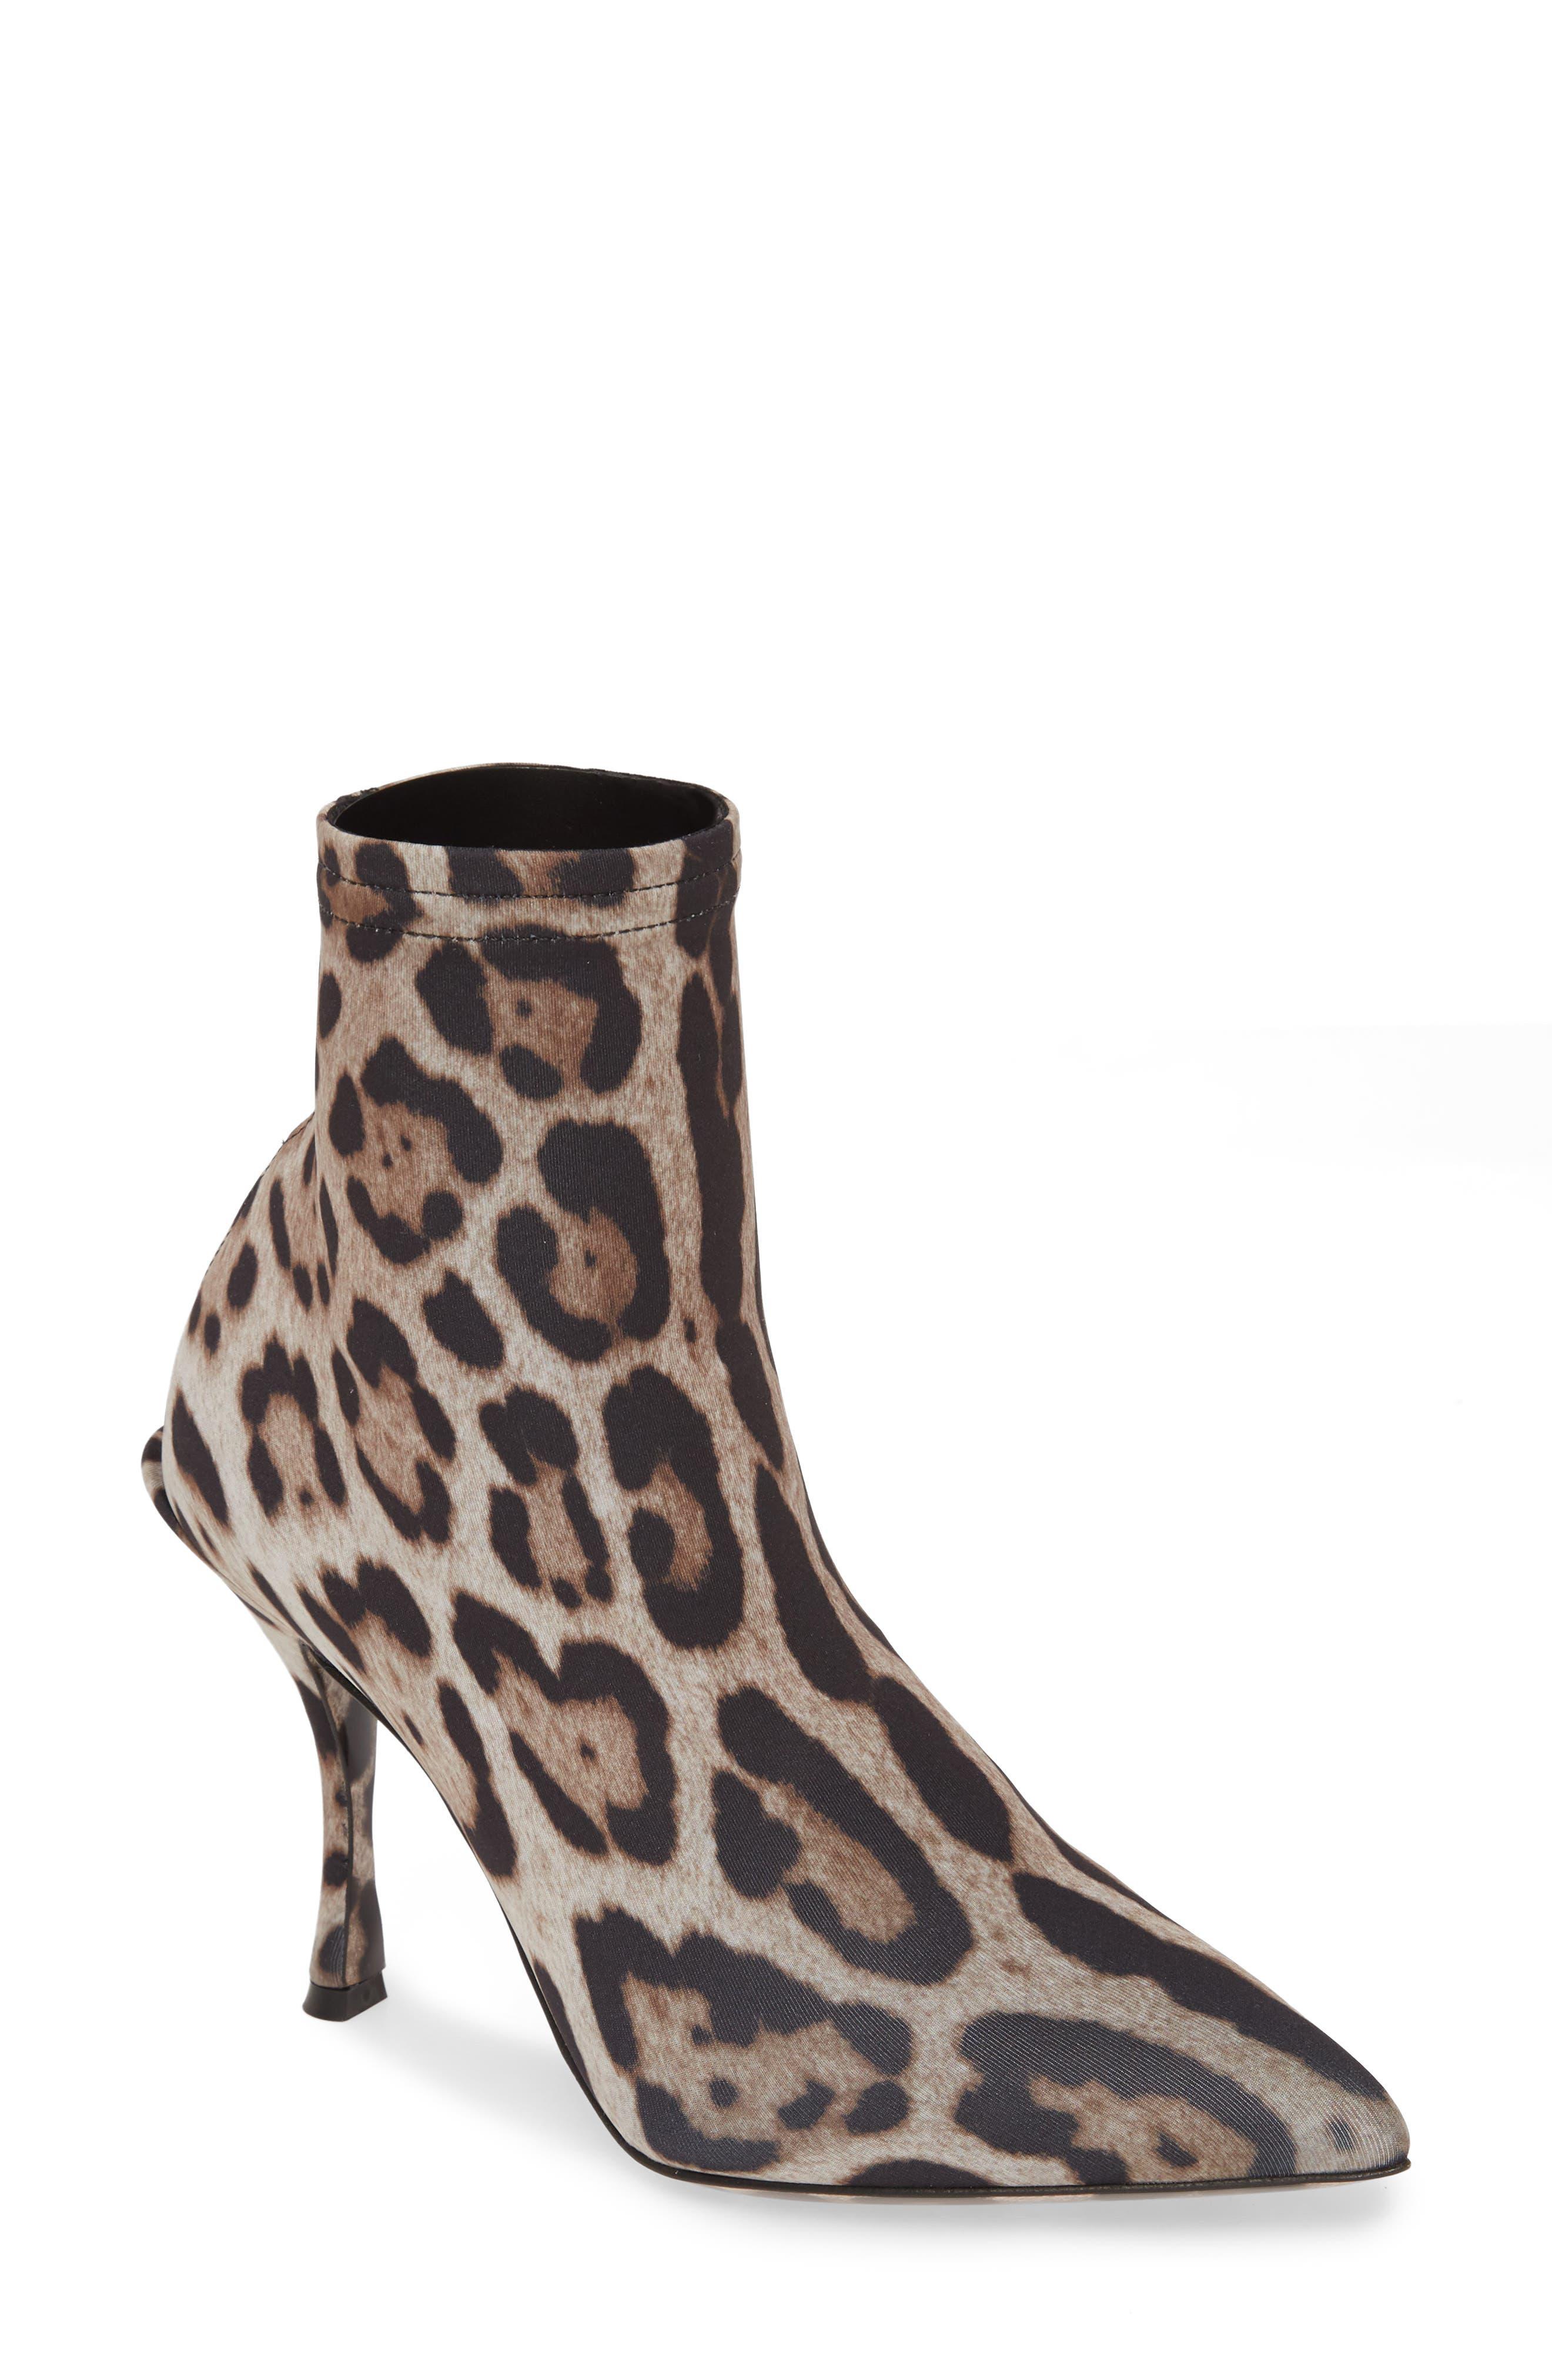 5996b733781 Women's Dolce&Gabbana Shoes | Nordstrom